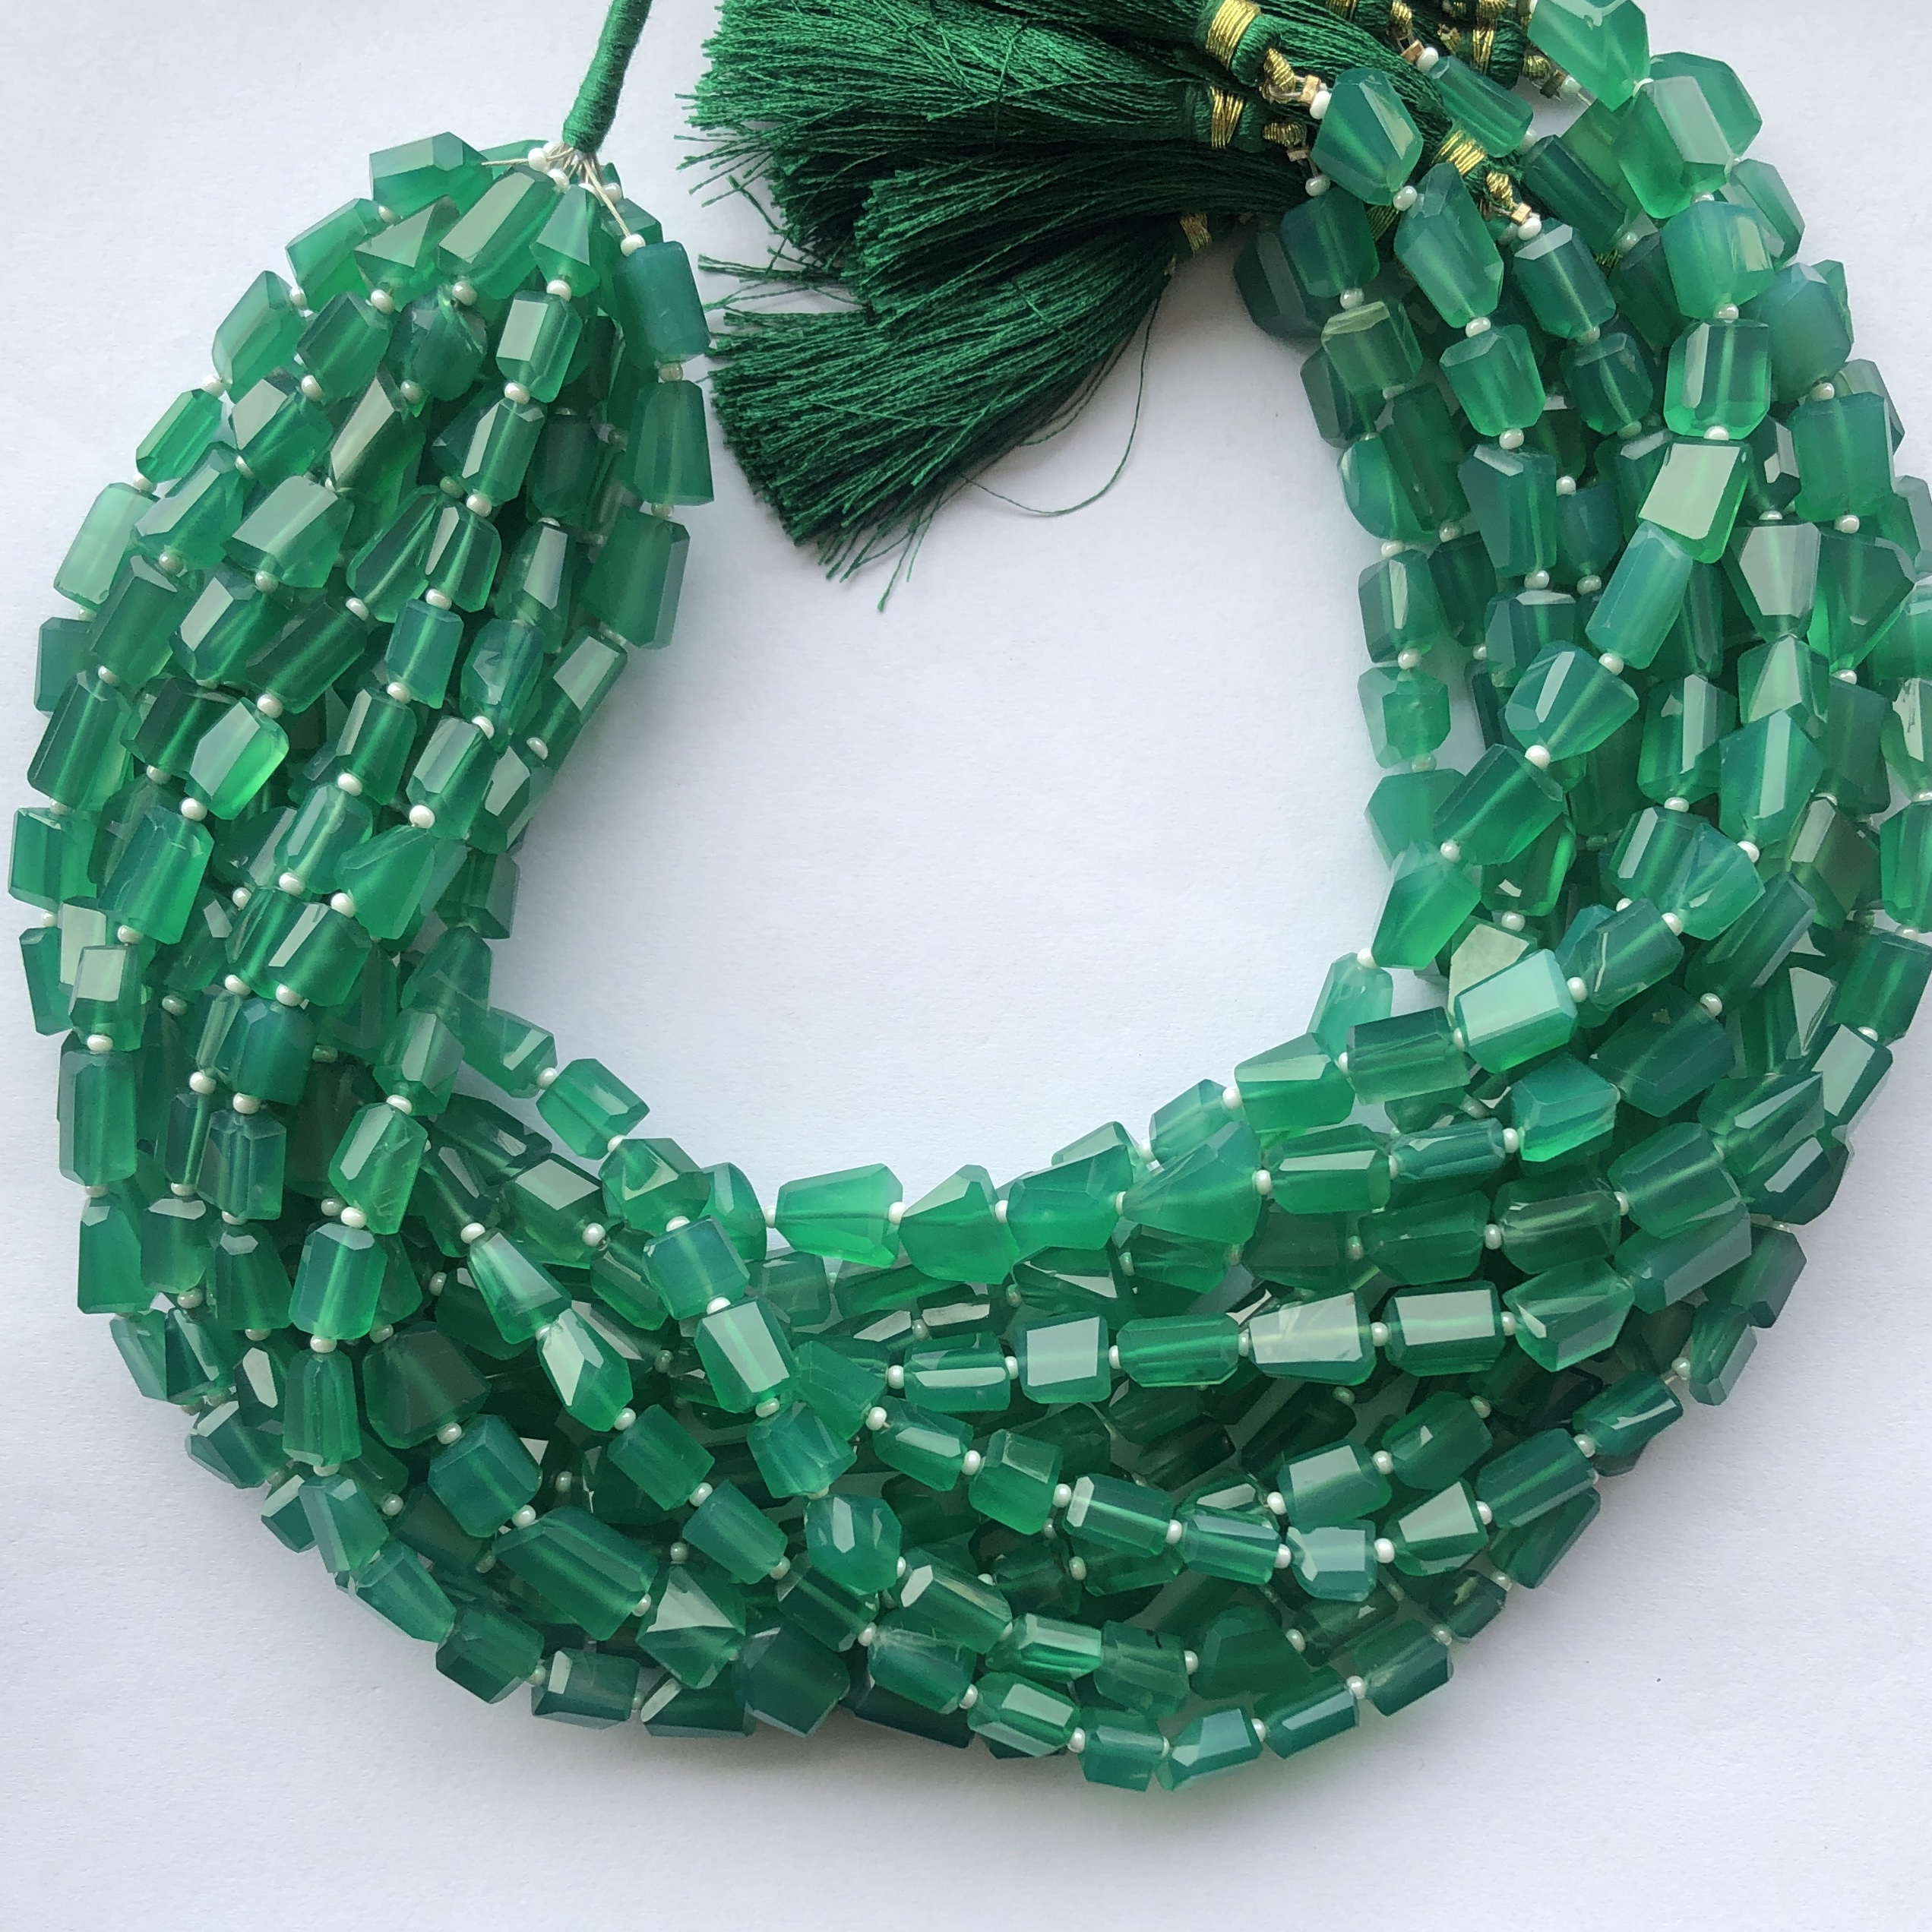 Green Onyx - Every GEM has its Story! BulkGemstones.com